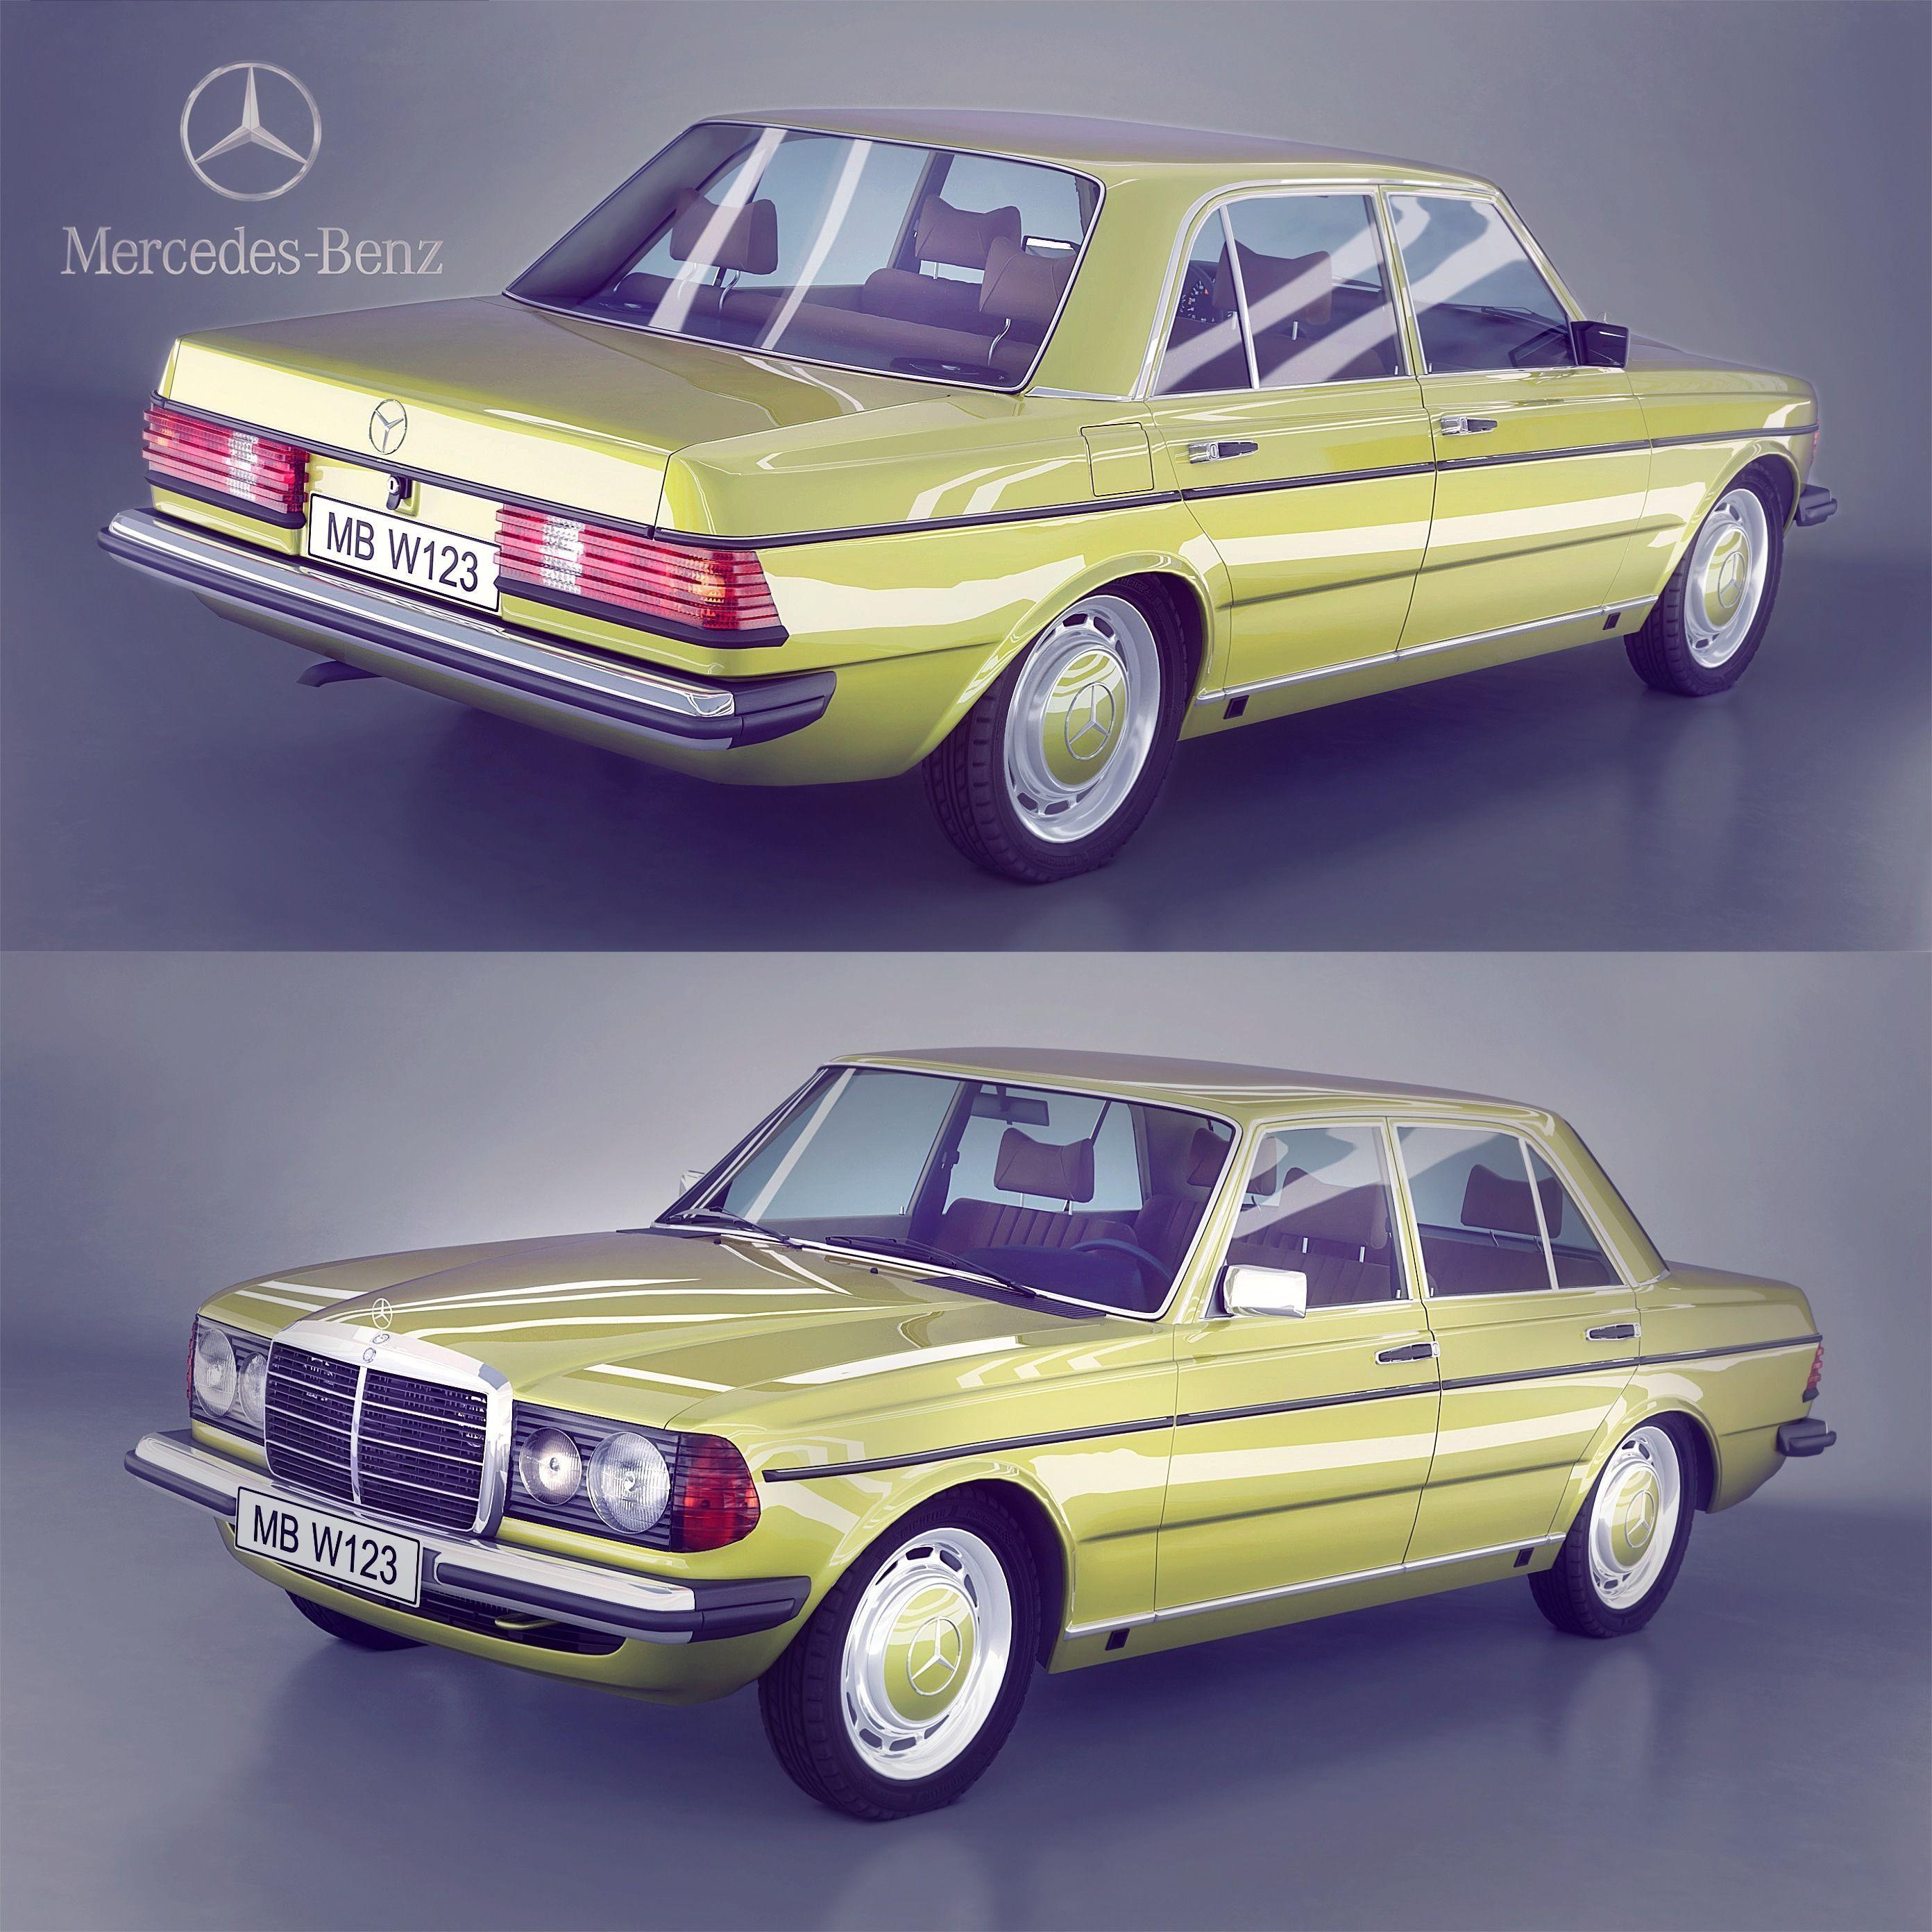 Mercedes-Benz E-Class (W123) - Classic Car Review   Honest ...   Benz W123